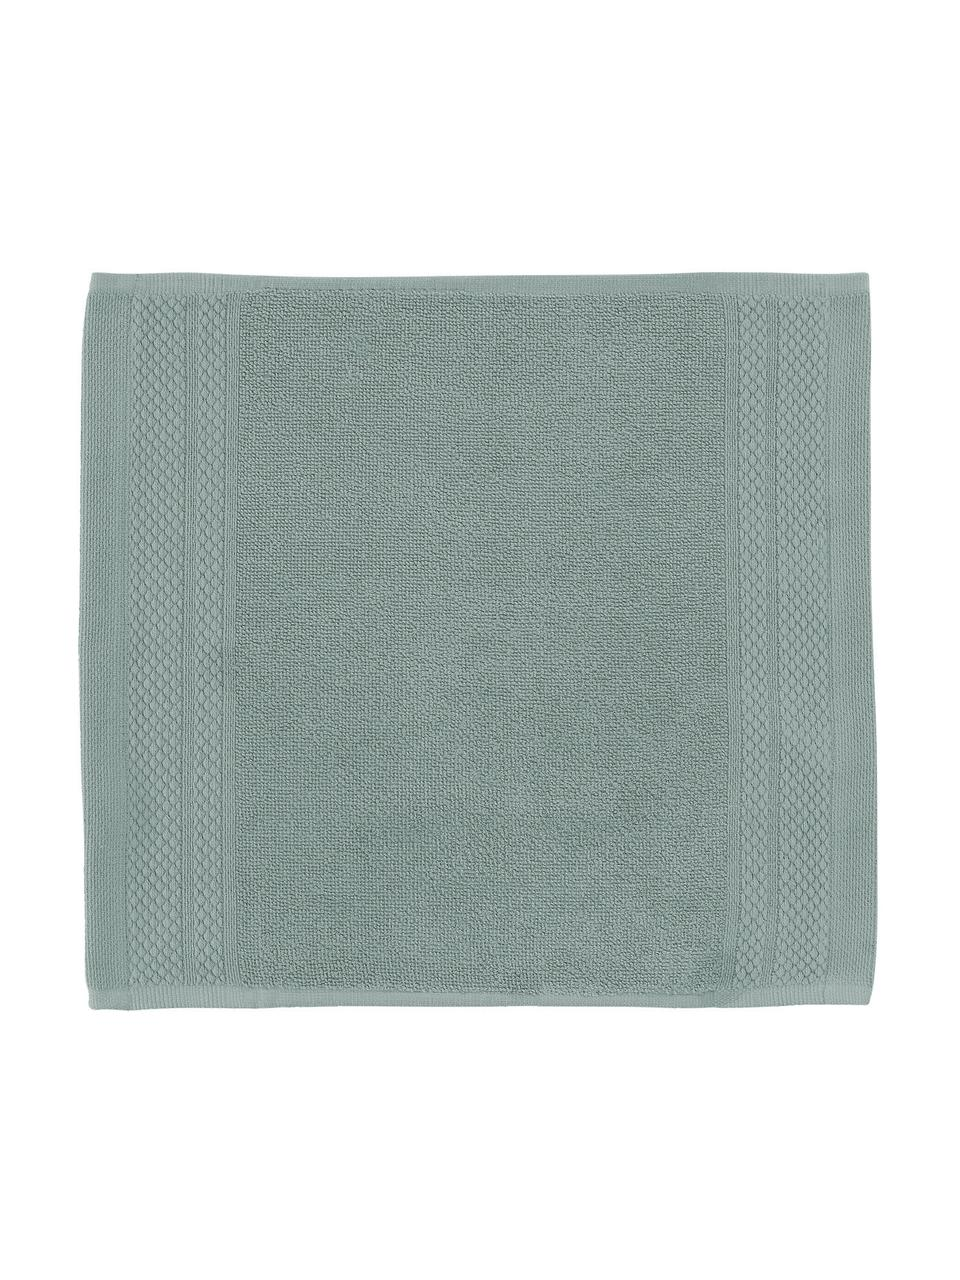 Asciugamano con bordo decorativo classico Premium, Verde, Asciugamano per ospiti Larg. 30 x Lung. 30 cm